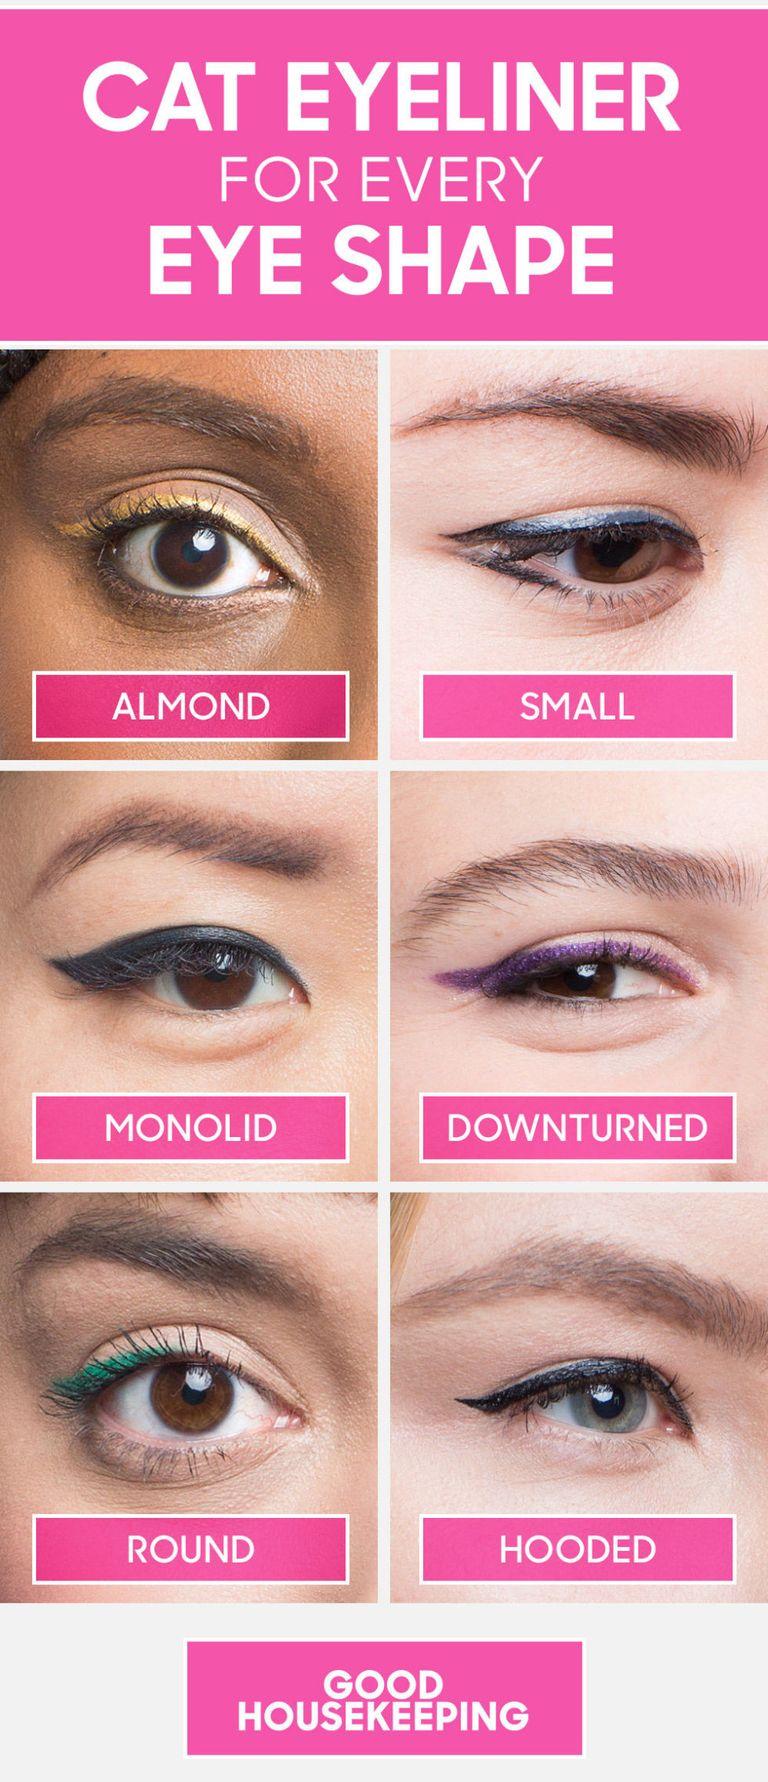 How to do winged eyeliner for every eye shape cat eyeliner tutorial winged eyeliner for every eye shape baditri Image collections